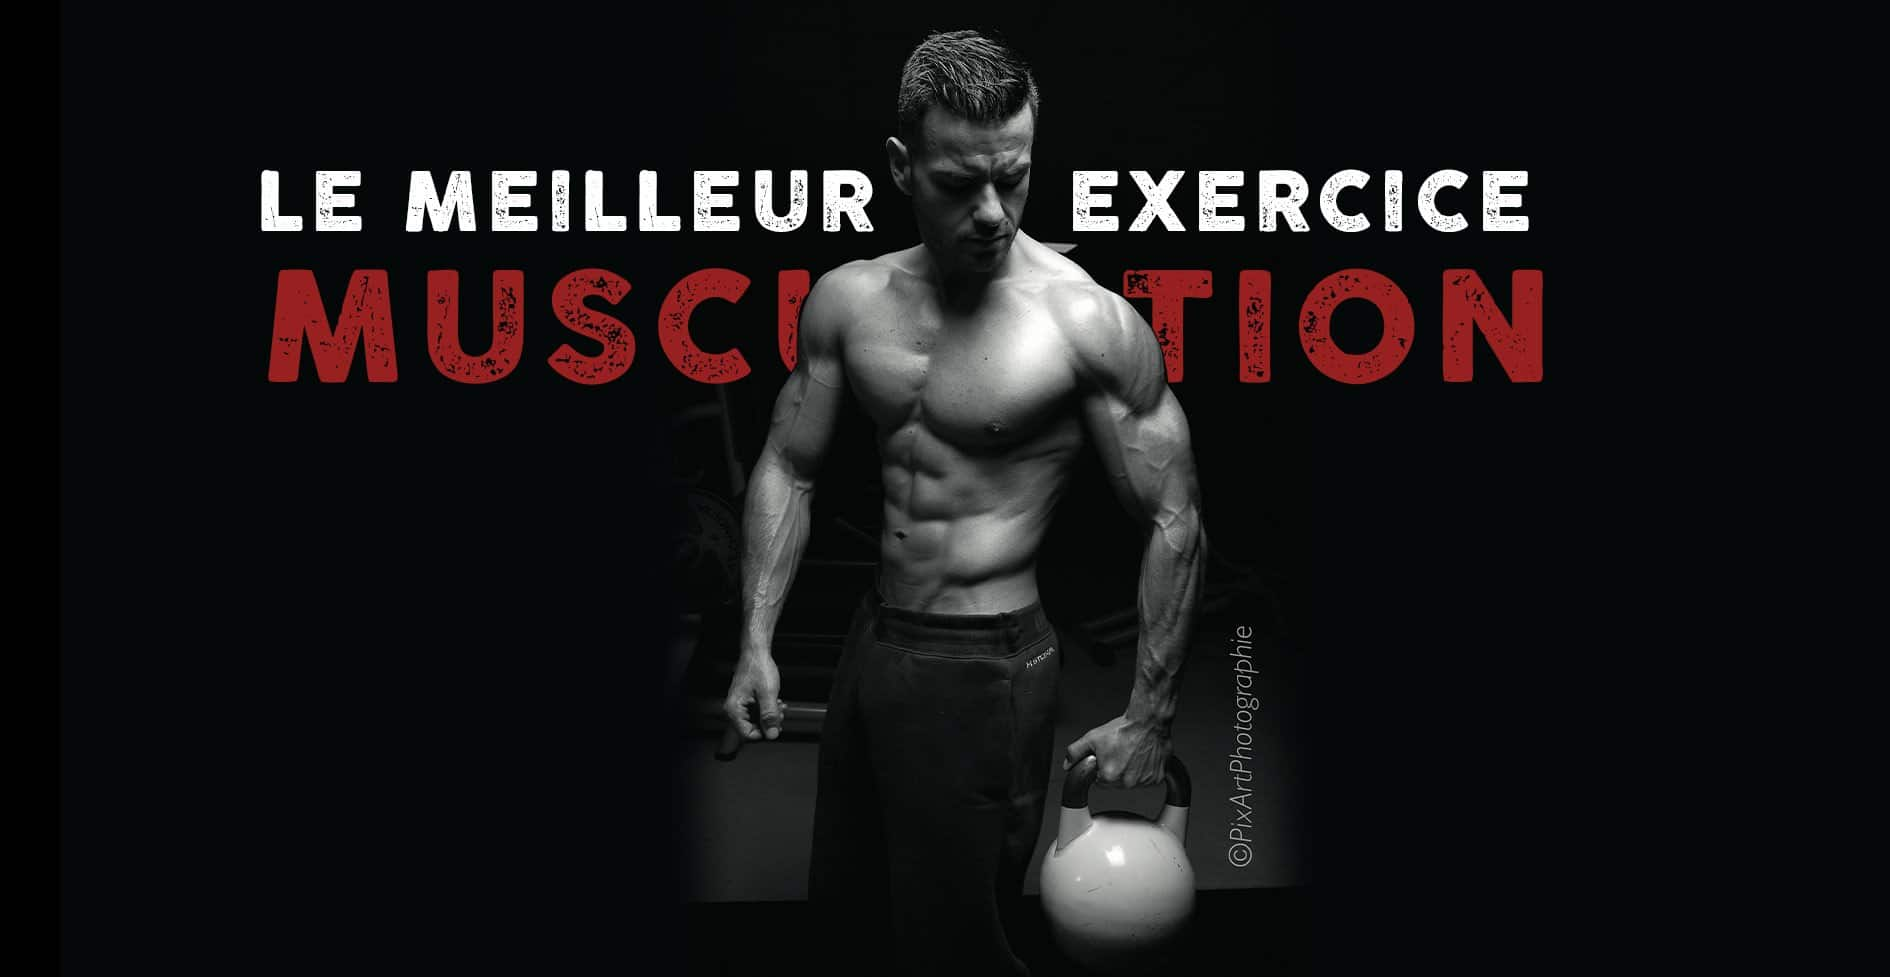 MEILLEUR EXERCICE EN MUSCULATION